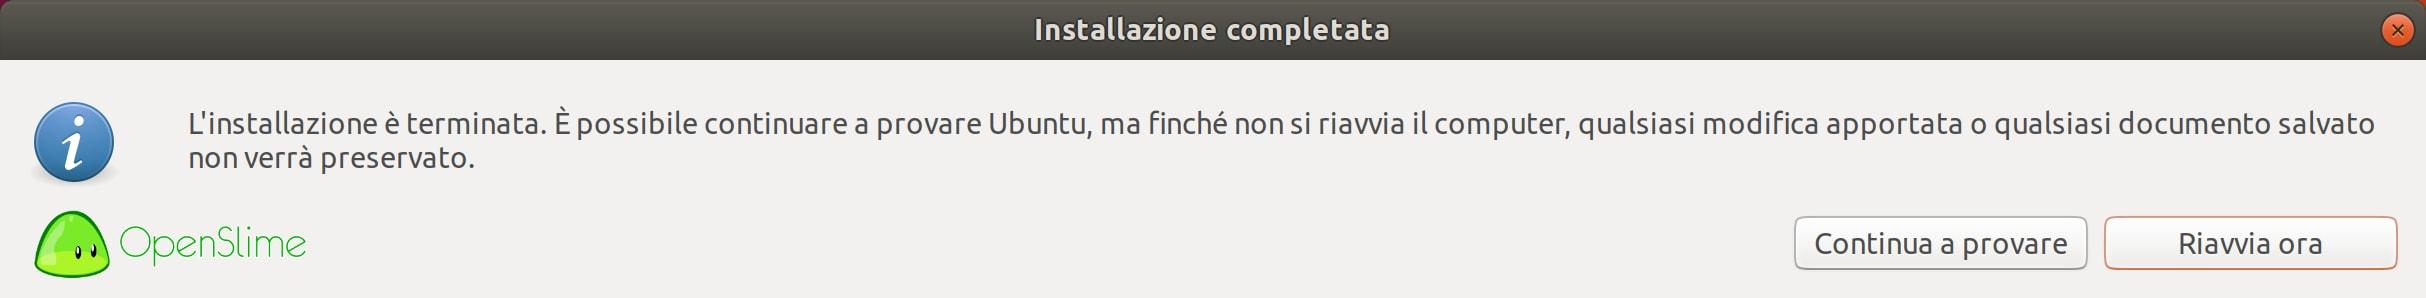 installer-9 - Recensione Ubuntu 18.04.1 LTS Bionic Beaver